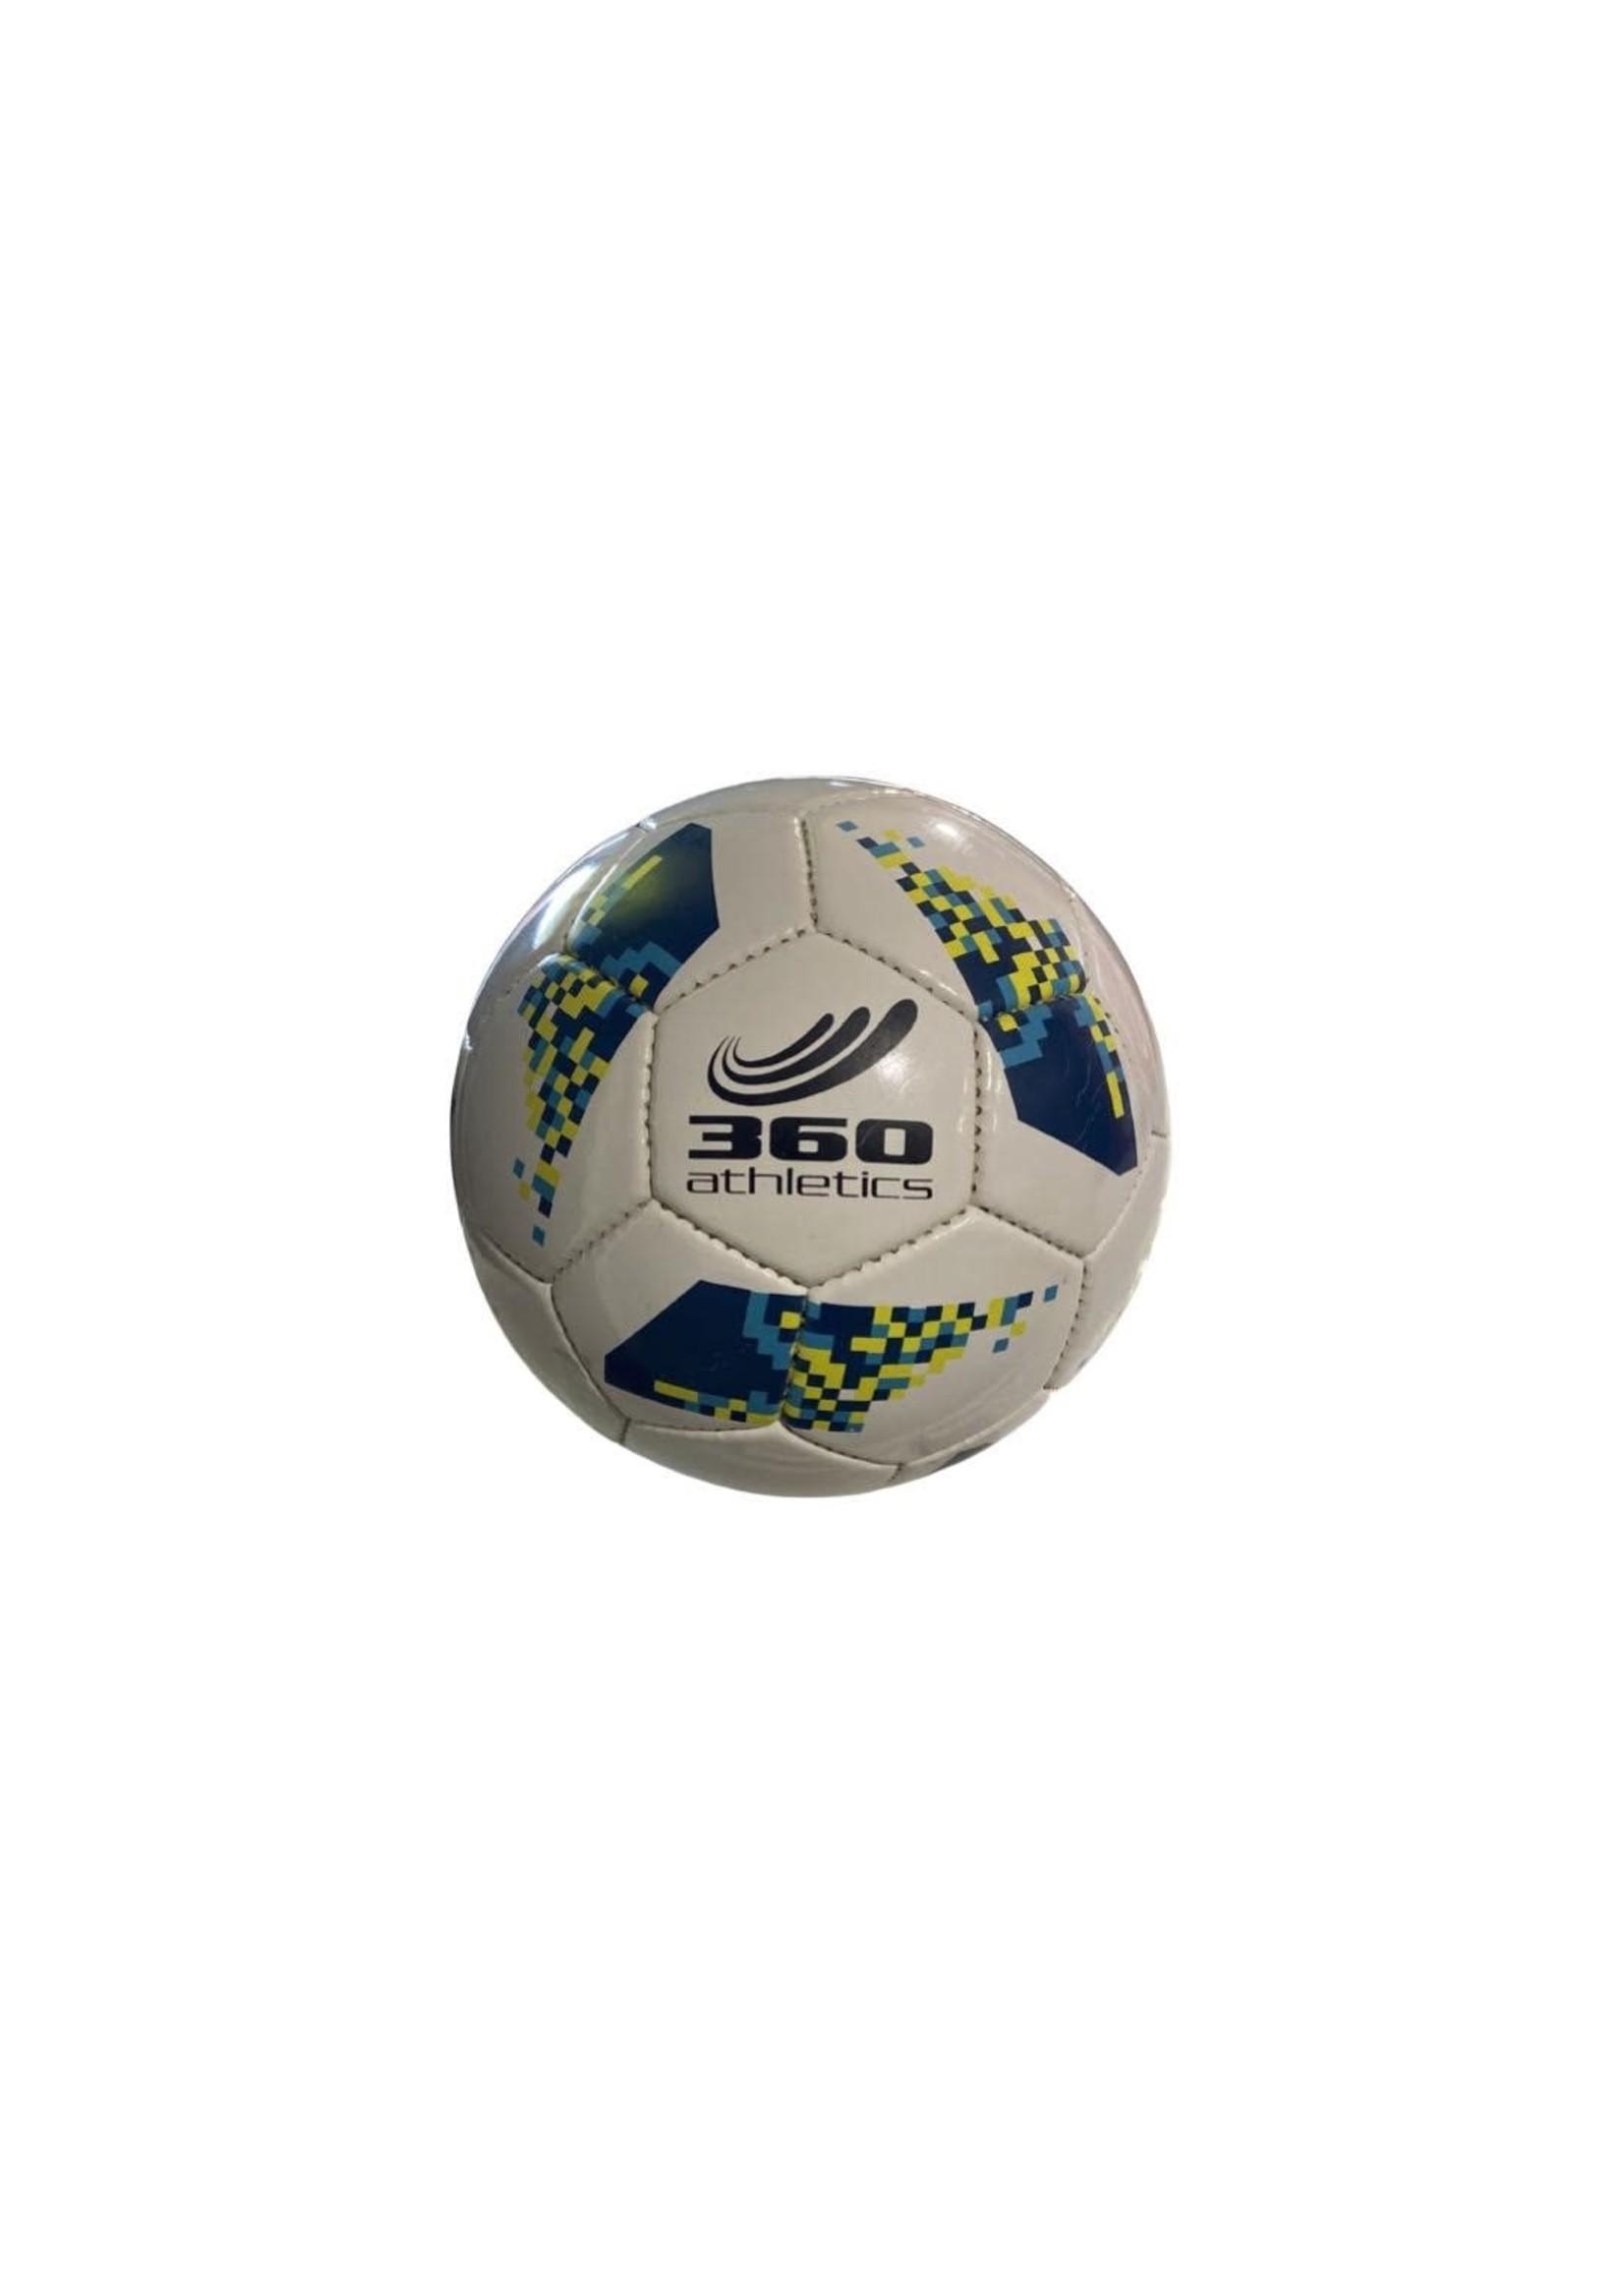 360 ATHLETICS 360 S0CCER BALL SUPER NOVA